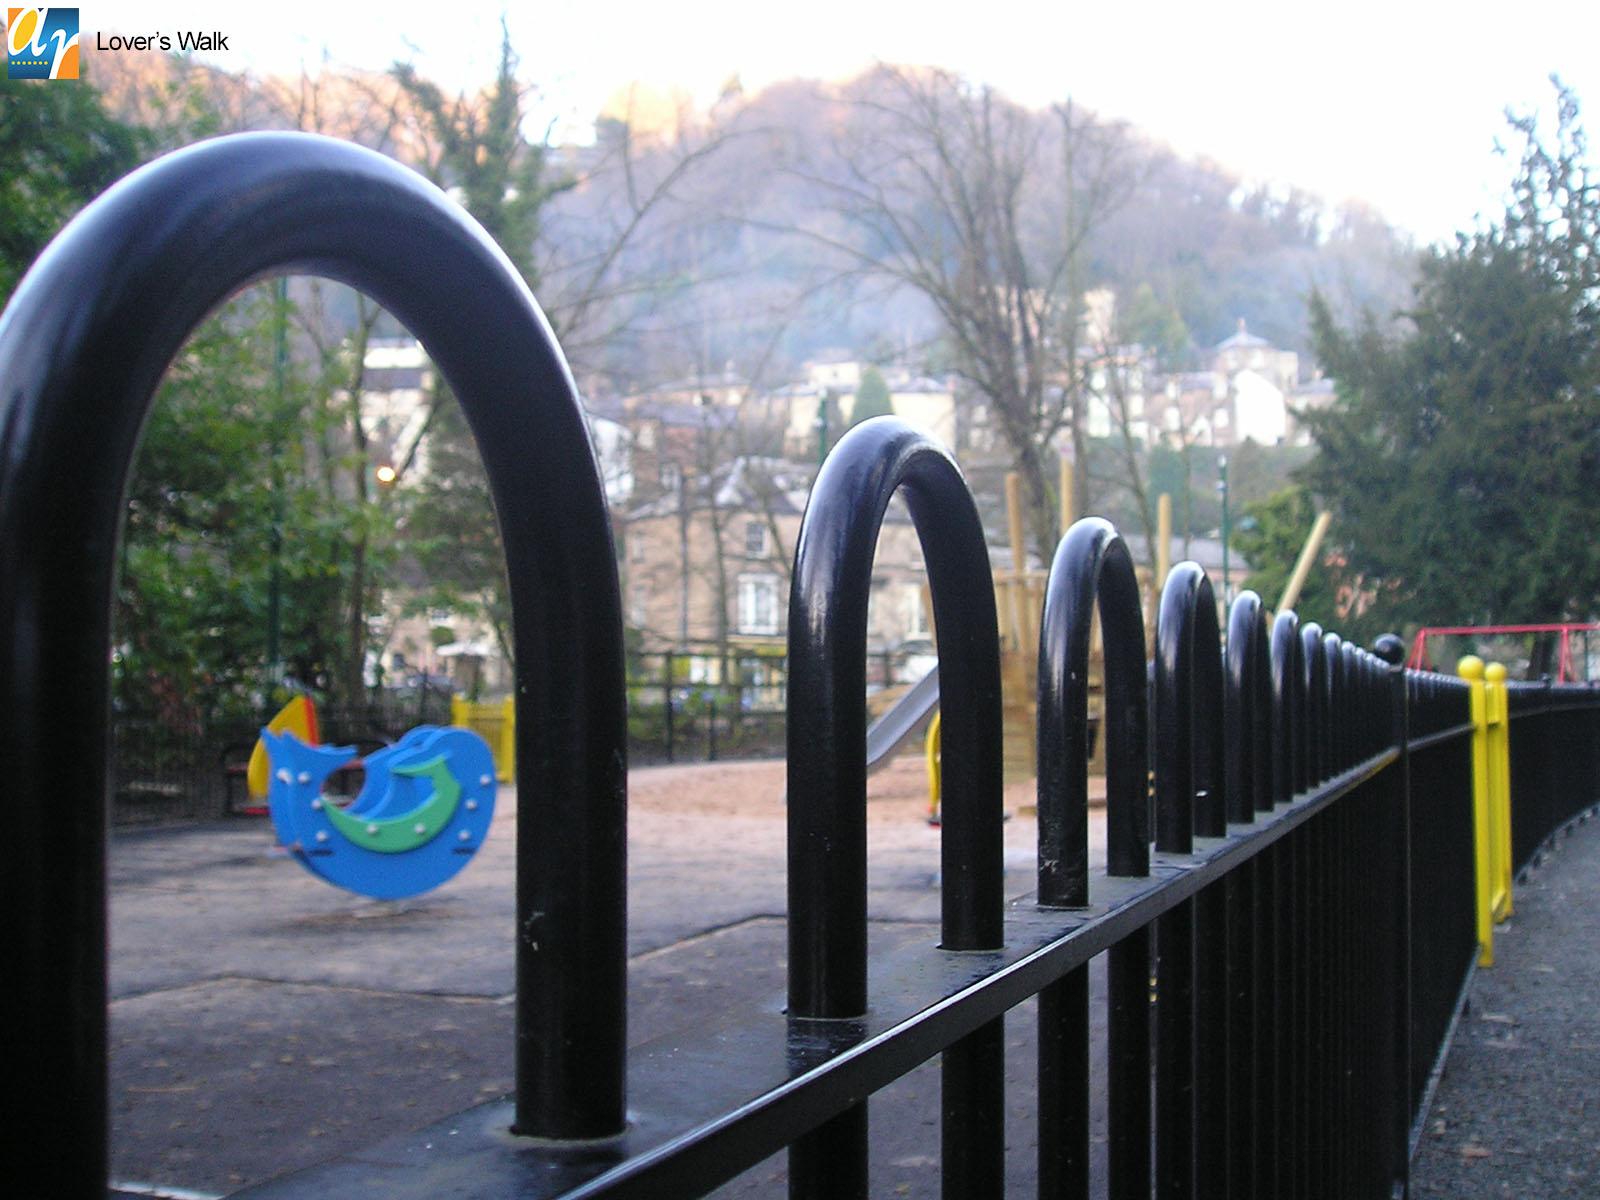 Lovers Walk standard bow top railings